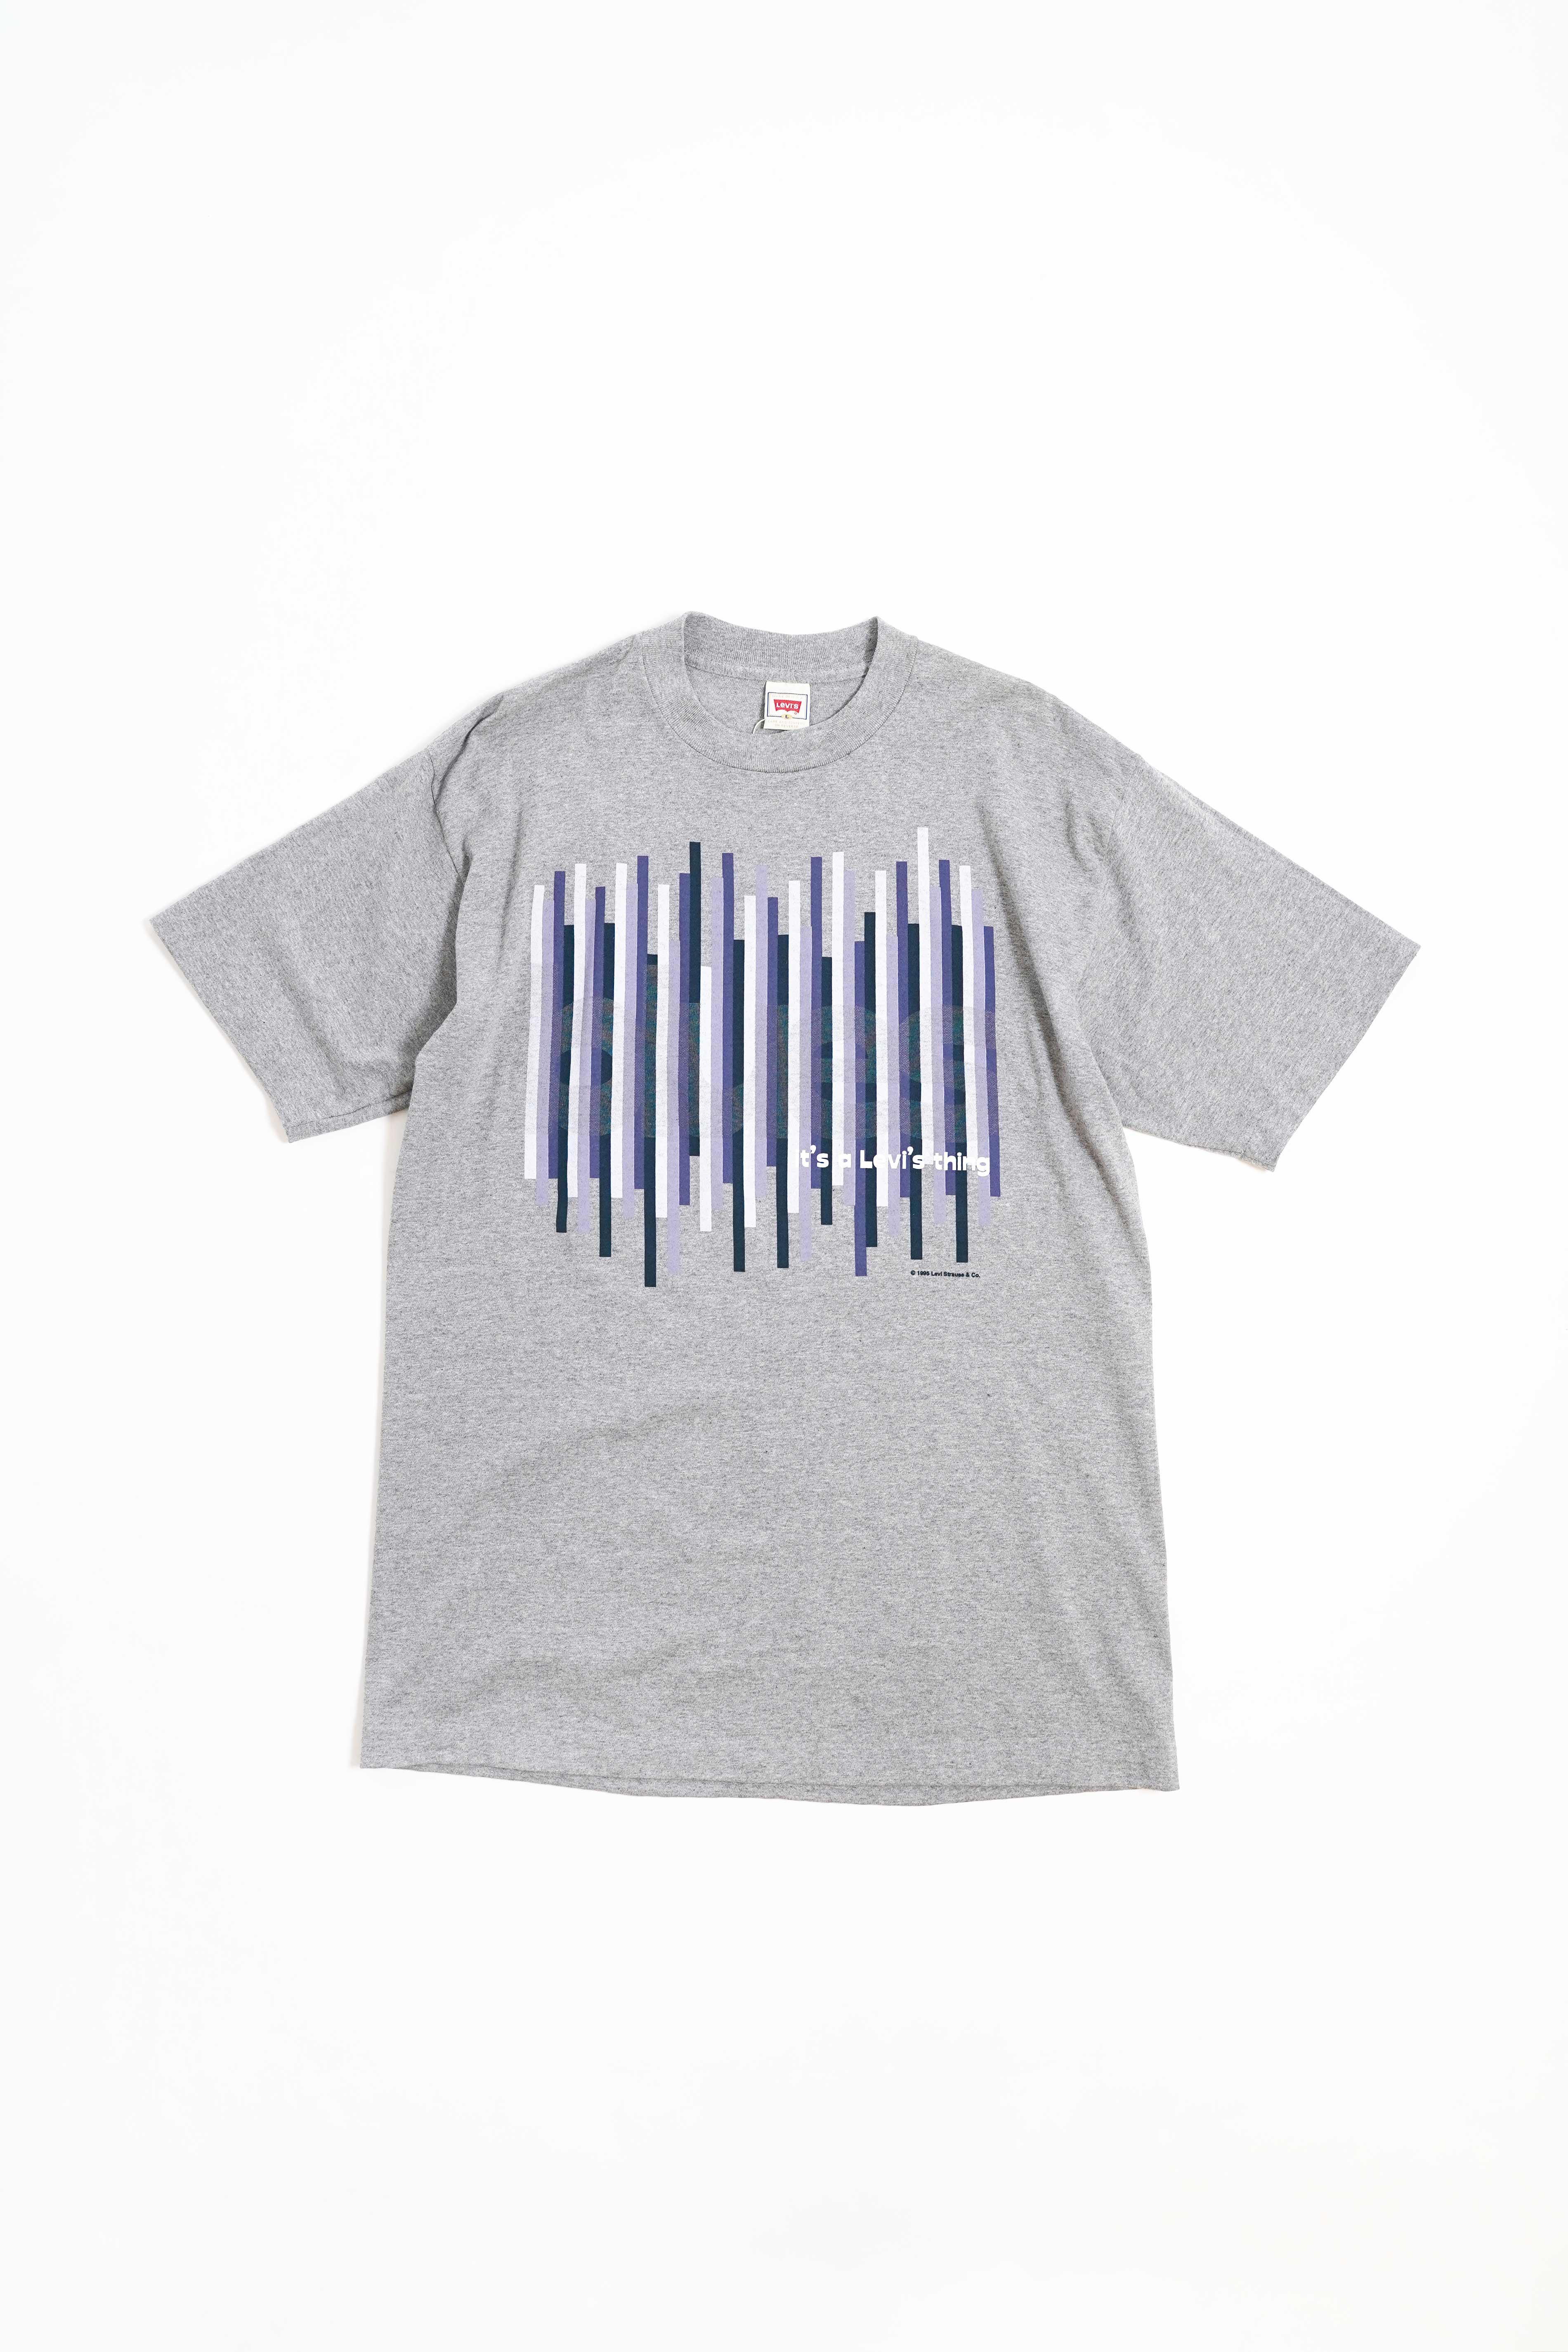 90'S LEVI'S PRINTED T-SHIRTS SAM DESIGN GRAY